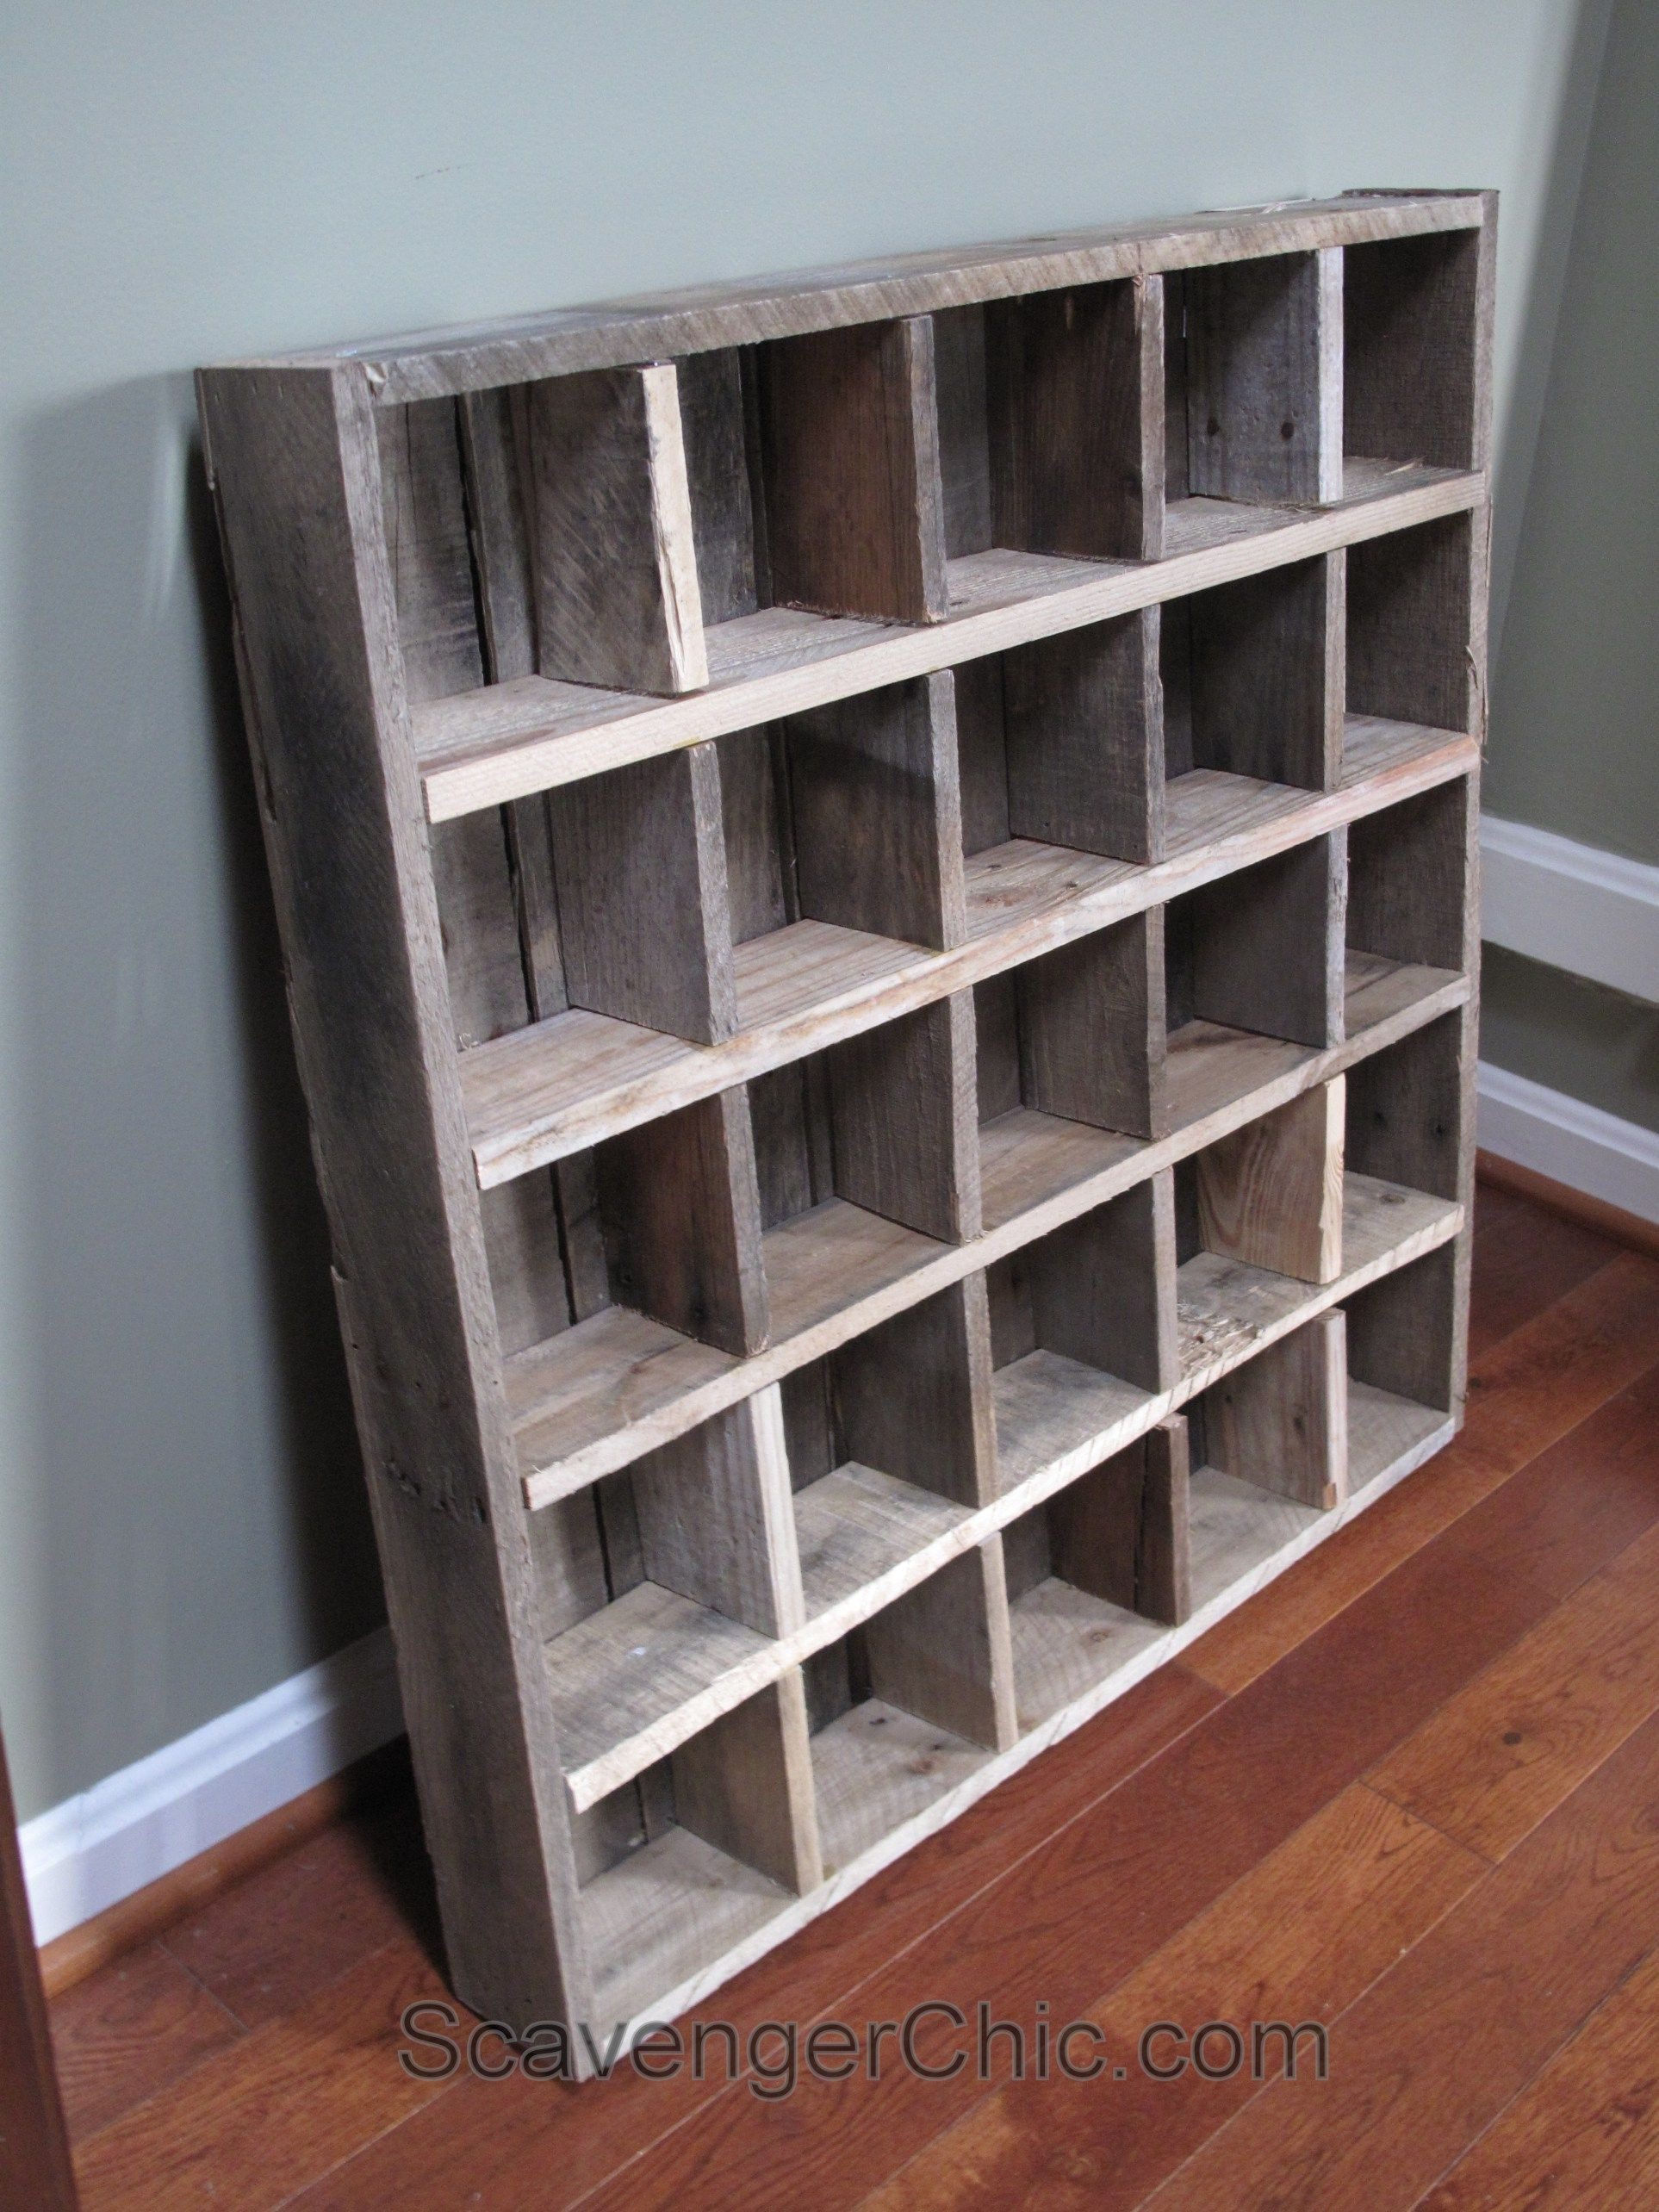 Pallet wood Cubby organizer shelves diy